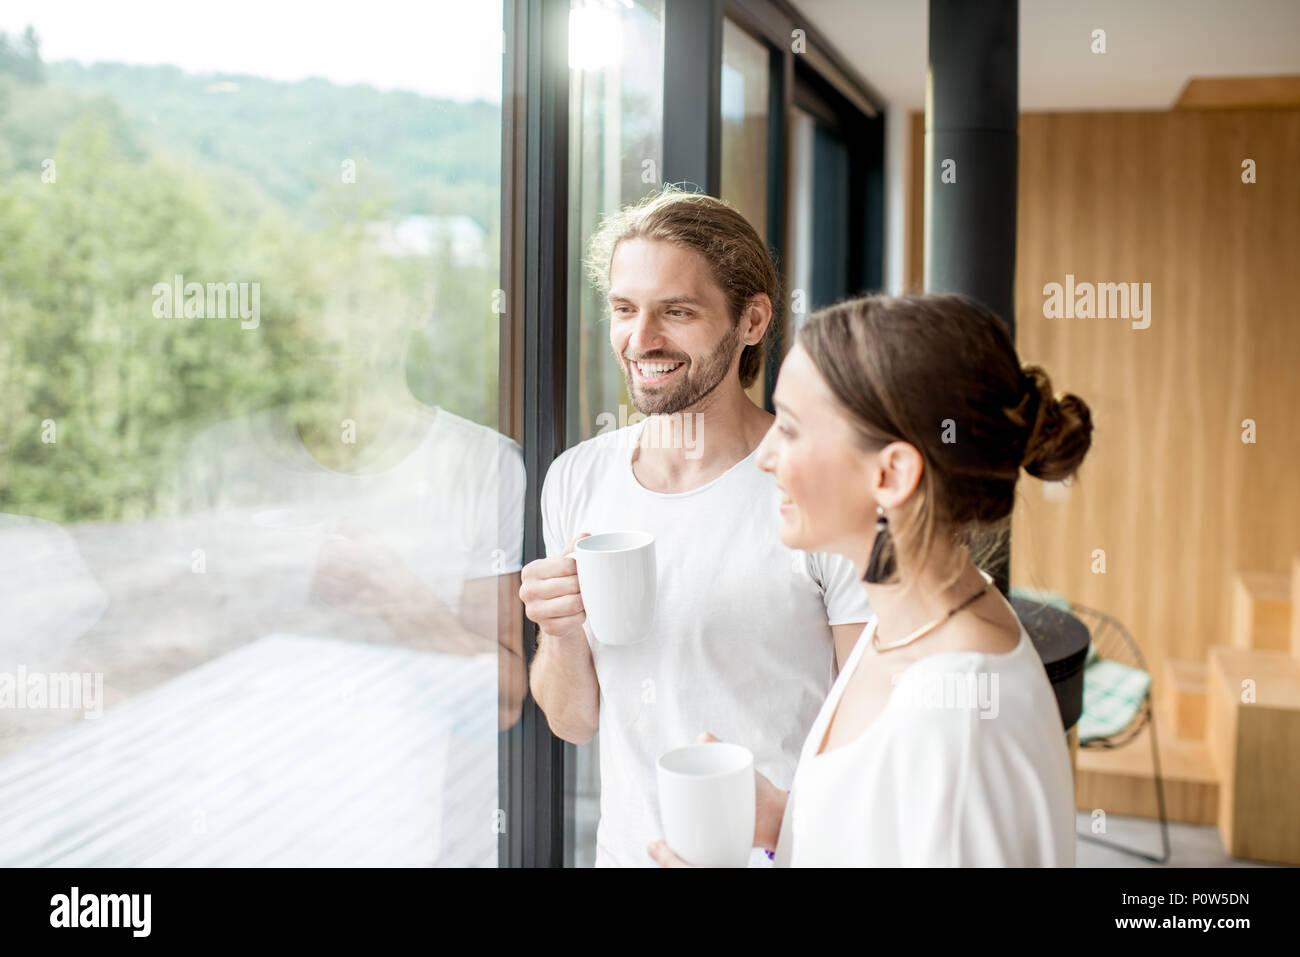 Par de pie cerca de la ventana interior Imagen De Stock